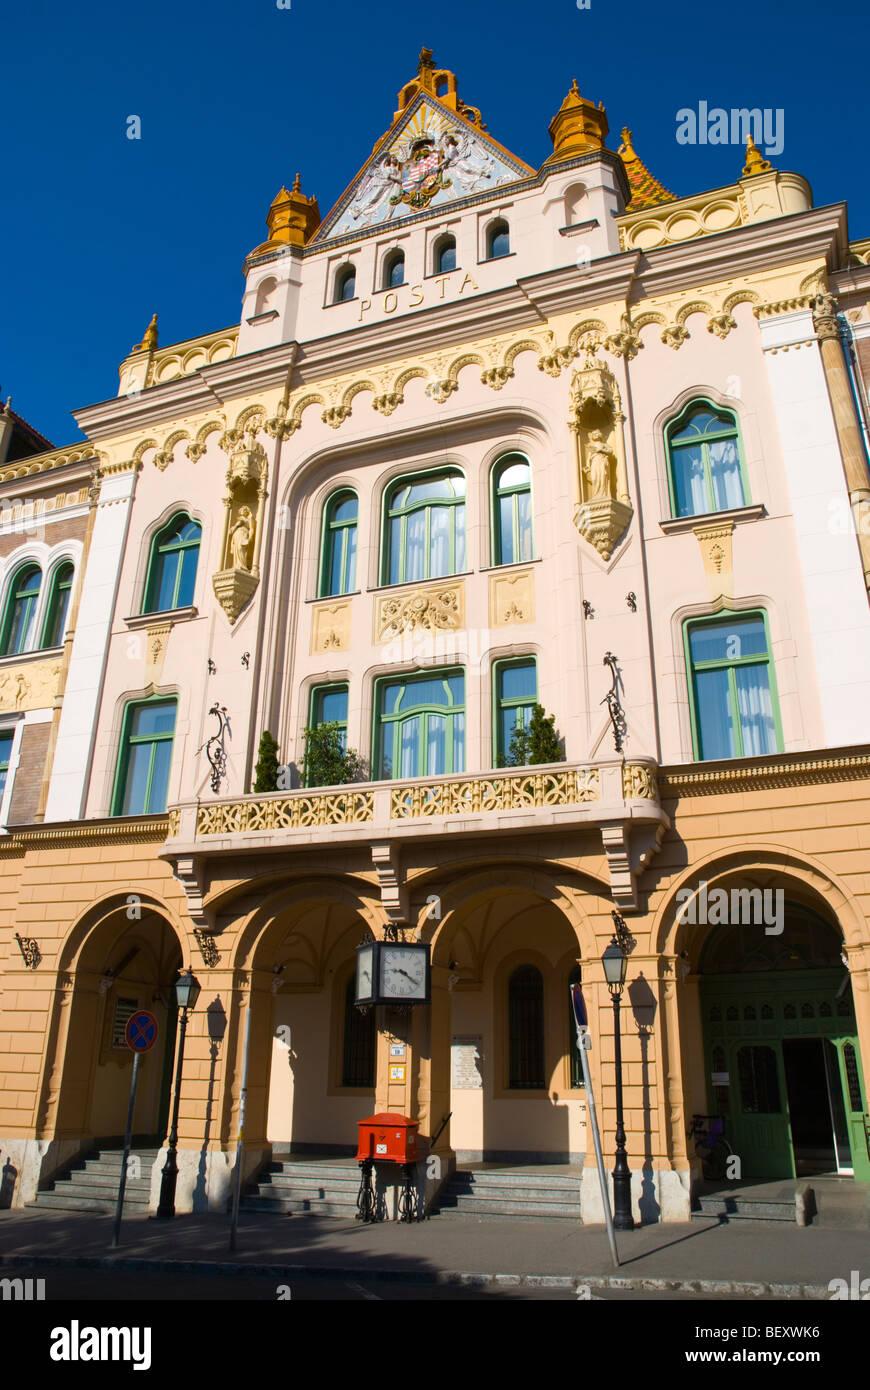 Postapalota The Main Post Office Building In Pecs Hungary